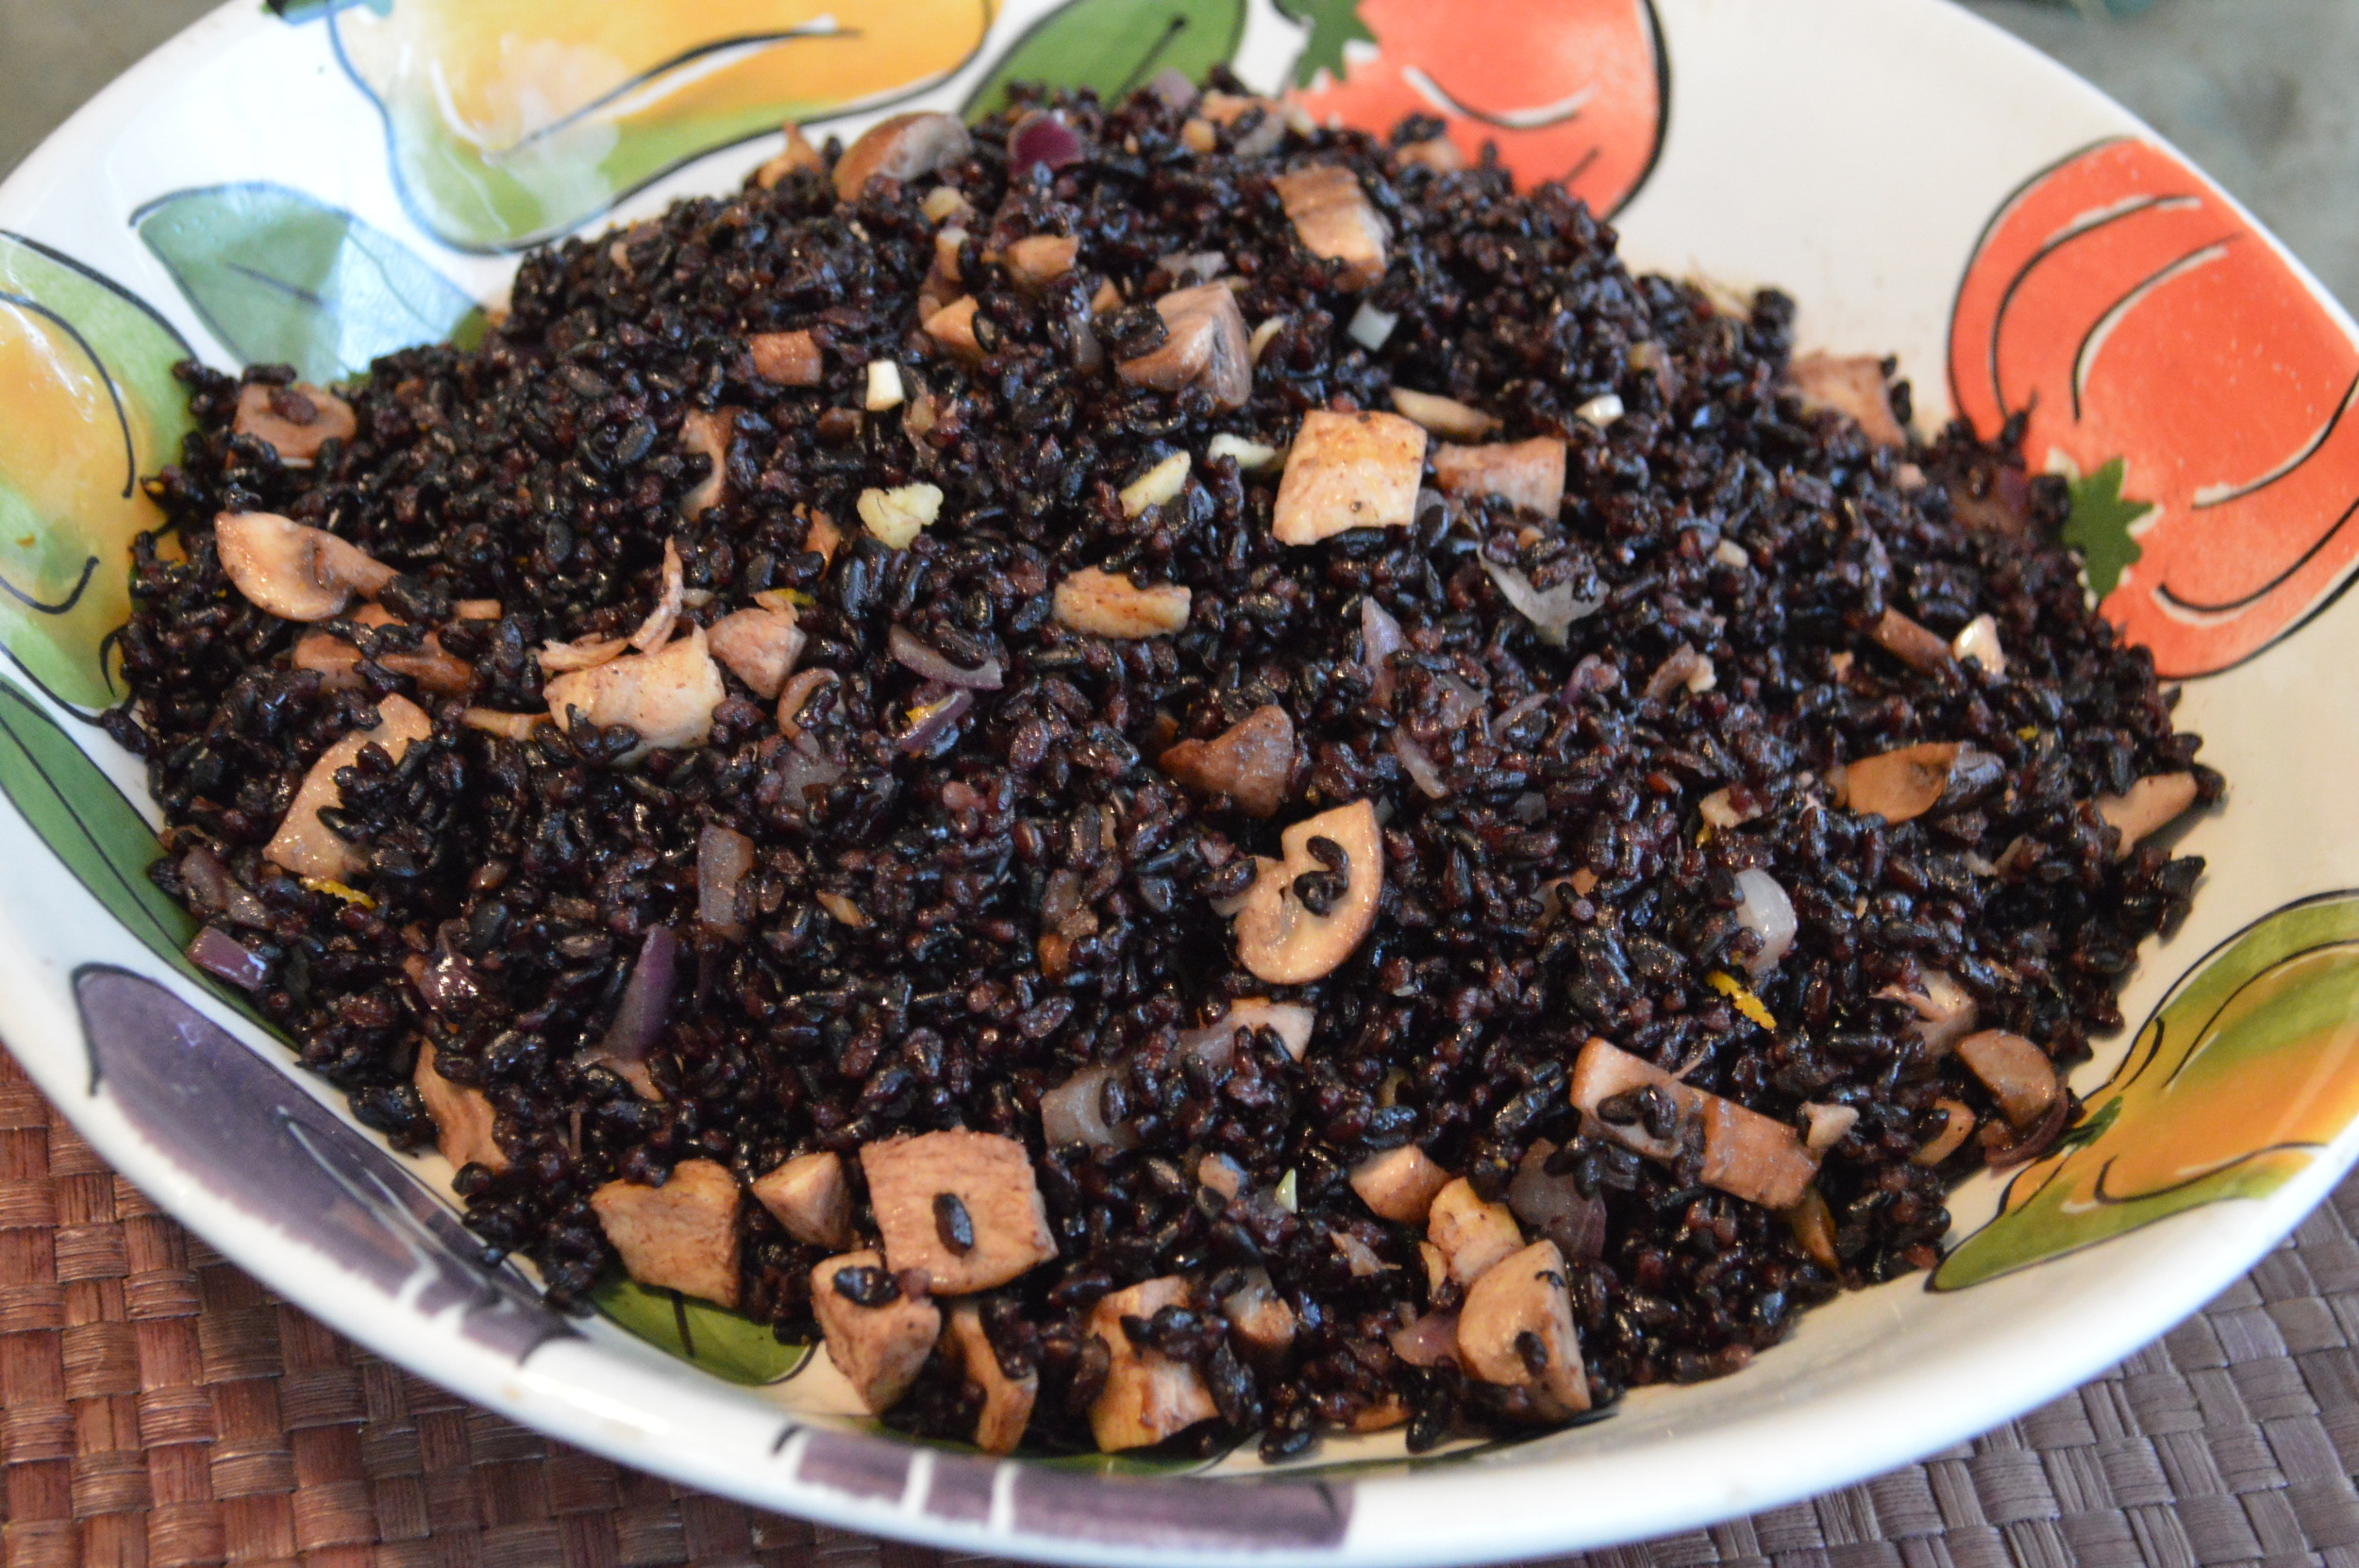 Black Rice Stir Fry